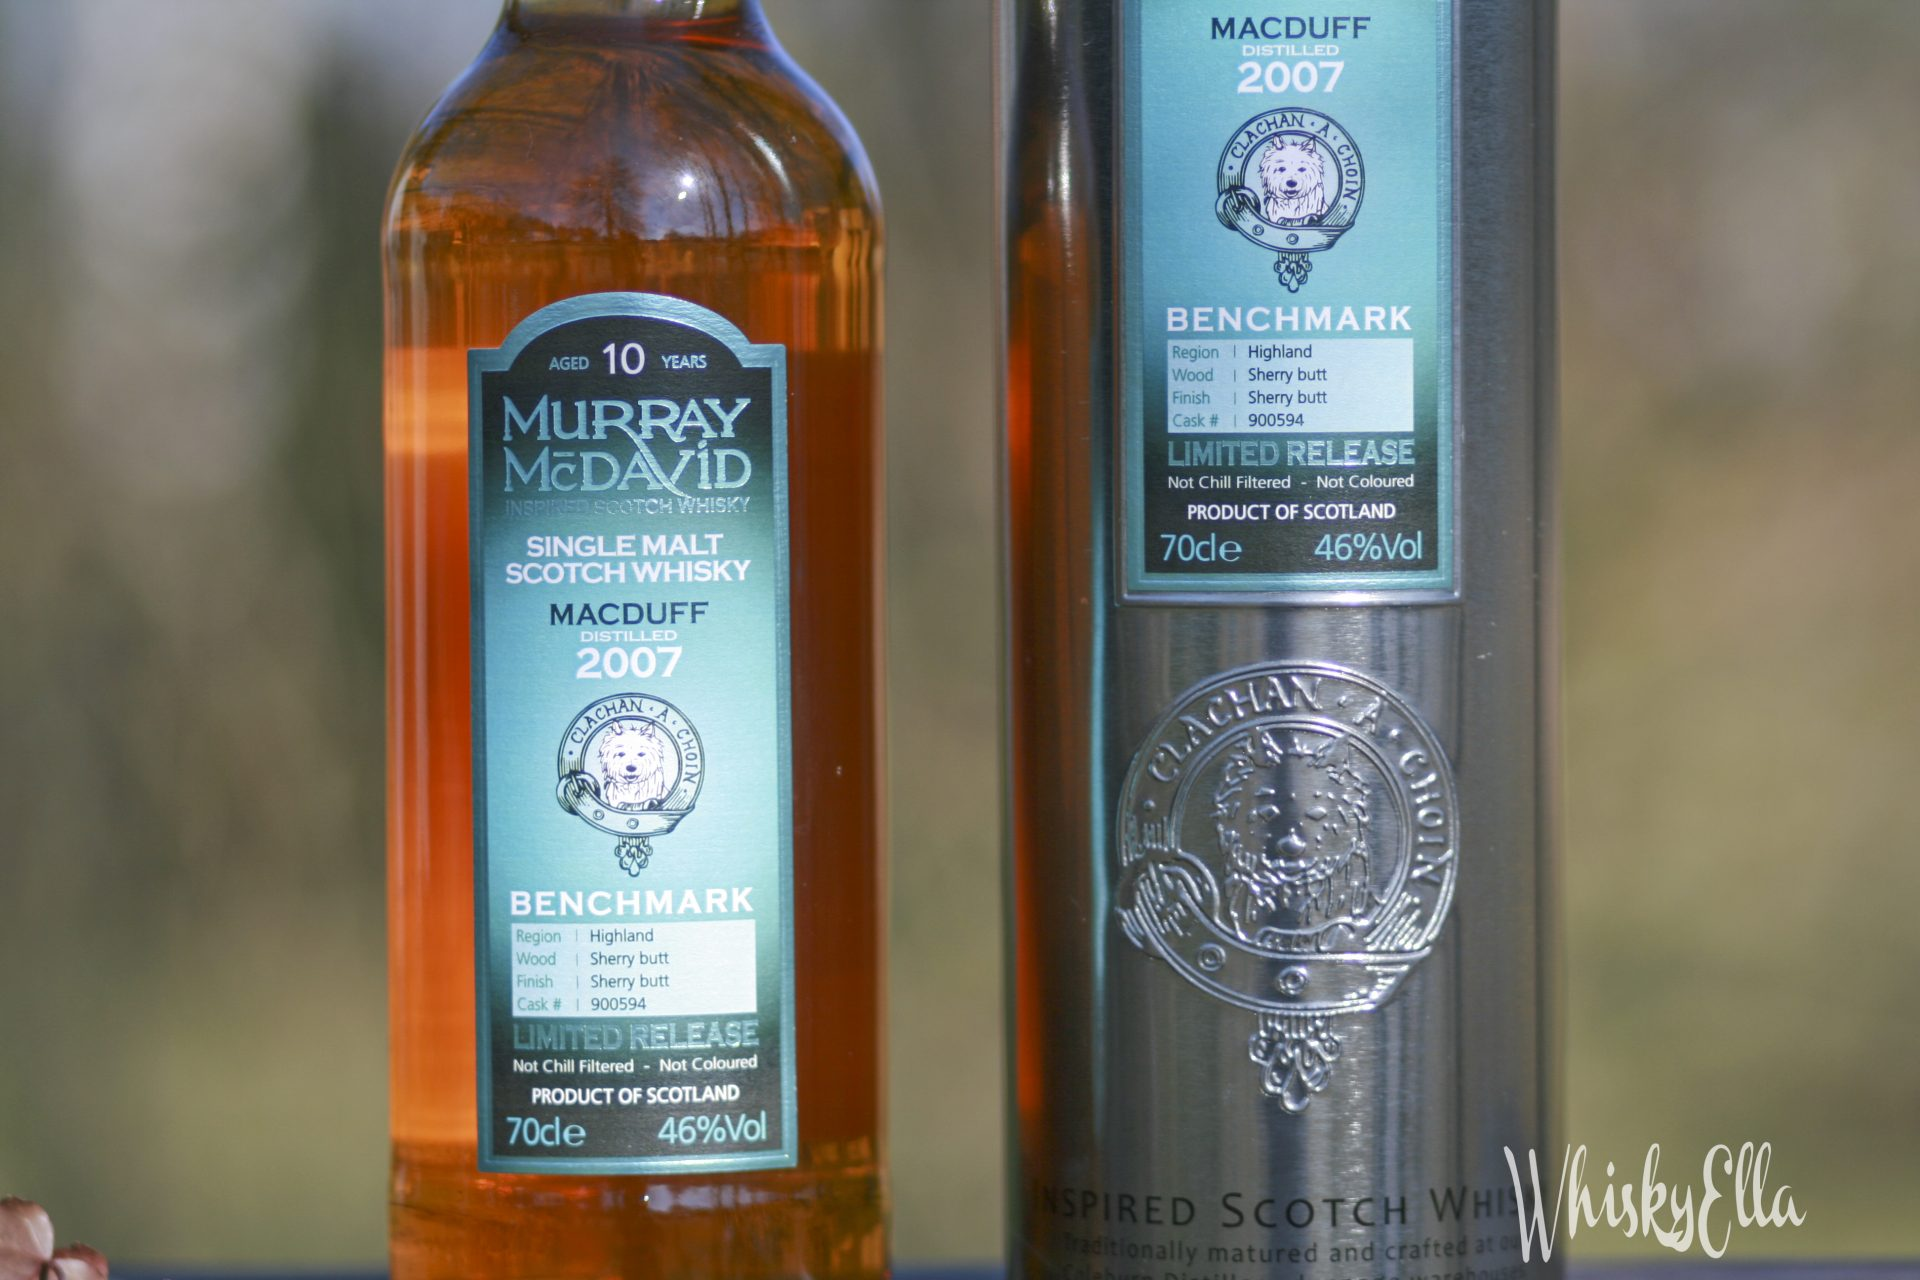 Nasza recenzja Macduff 2007 10yo Murray McDavid #73